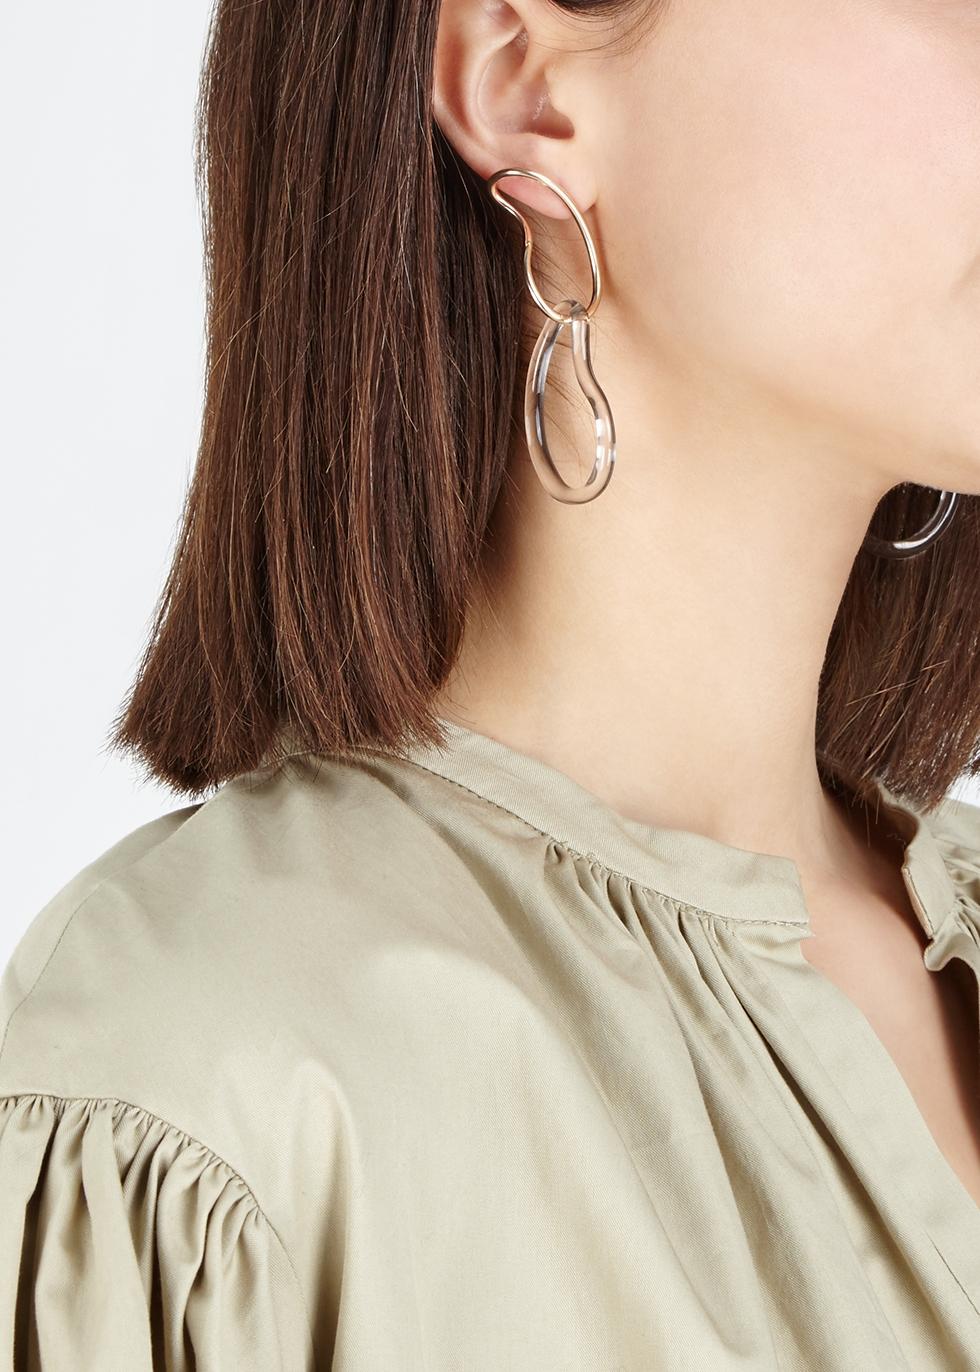 Glass hoop earrings - Annika Inez